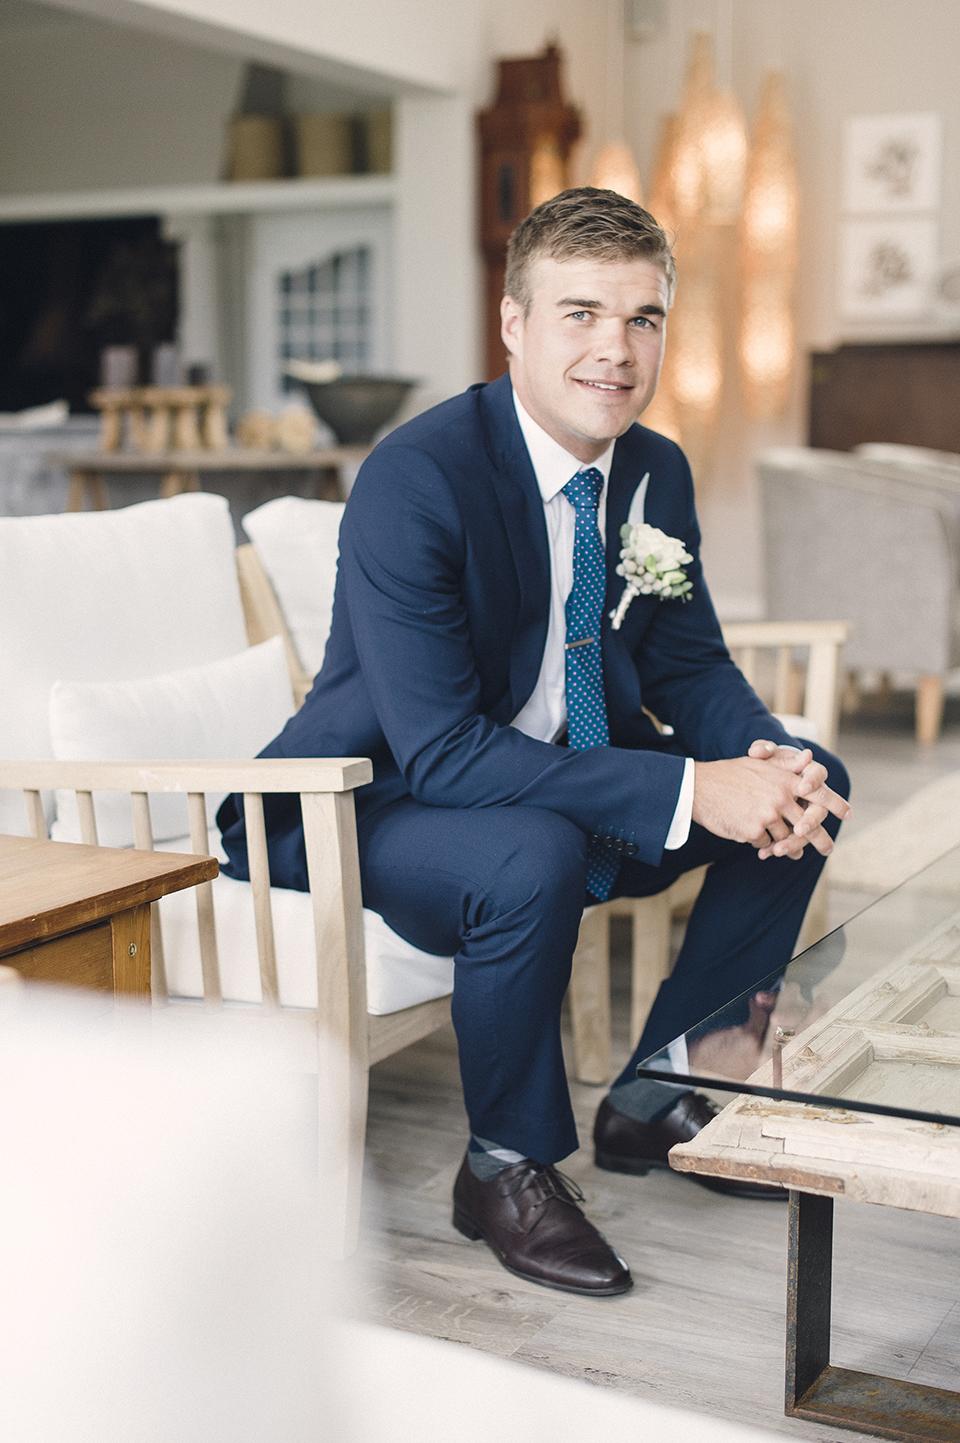 RyanParker_WeddingPhotographer_FineArt_CapeTown_BonaDea_Hermanus_S&A_DSC_1328.jpg